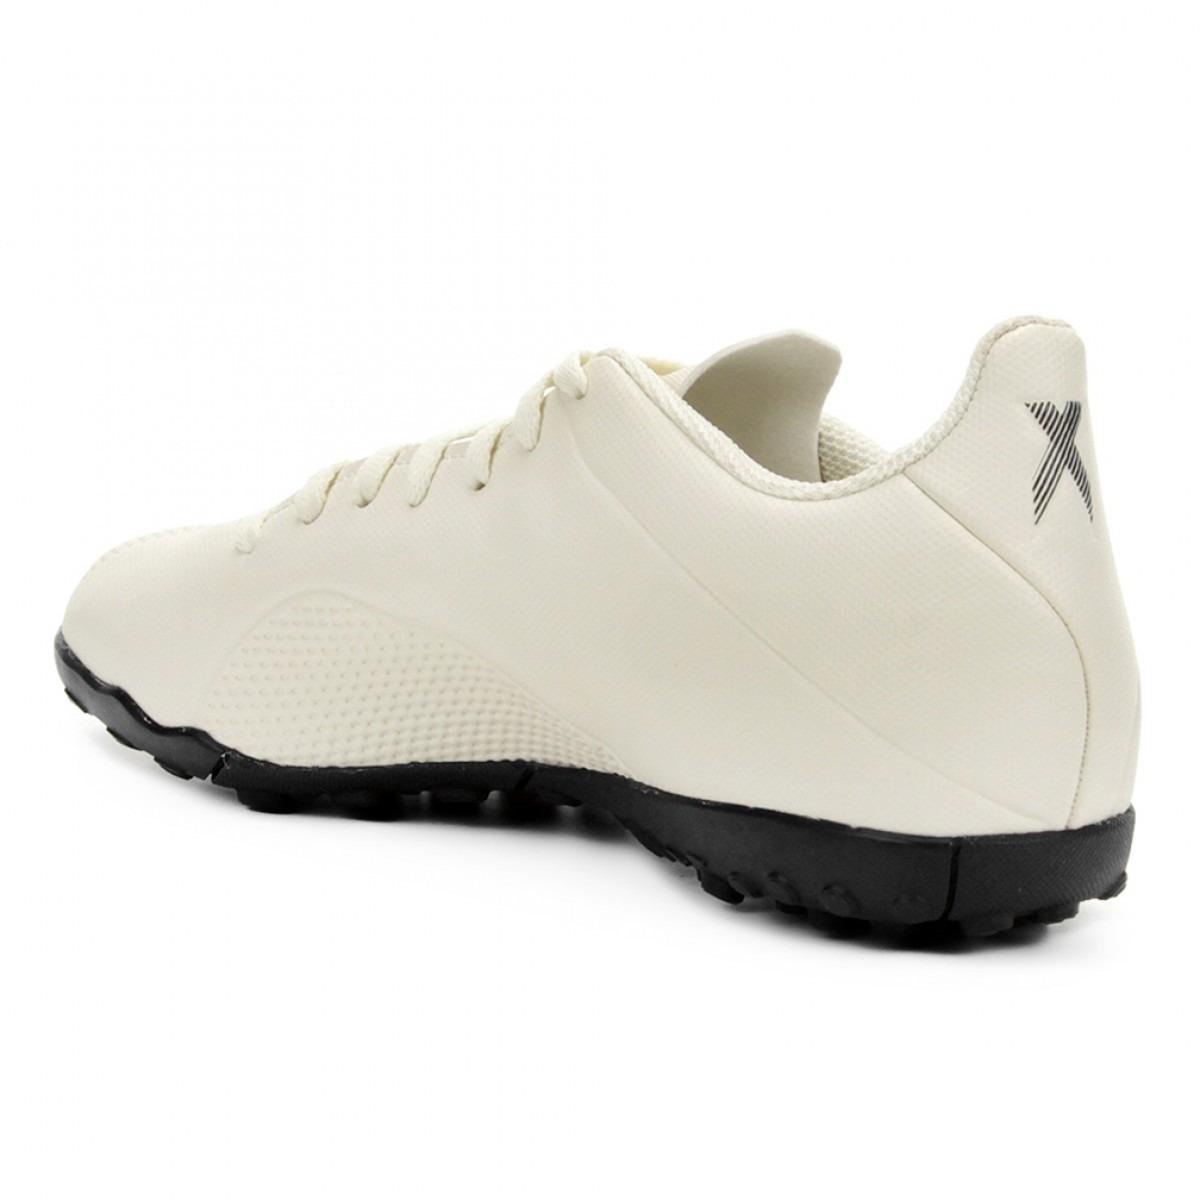 Chuteira Society adidas X Tango 18 4 Tf Masculina - Branca E - R ... a5a8b34c95d8b